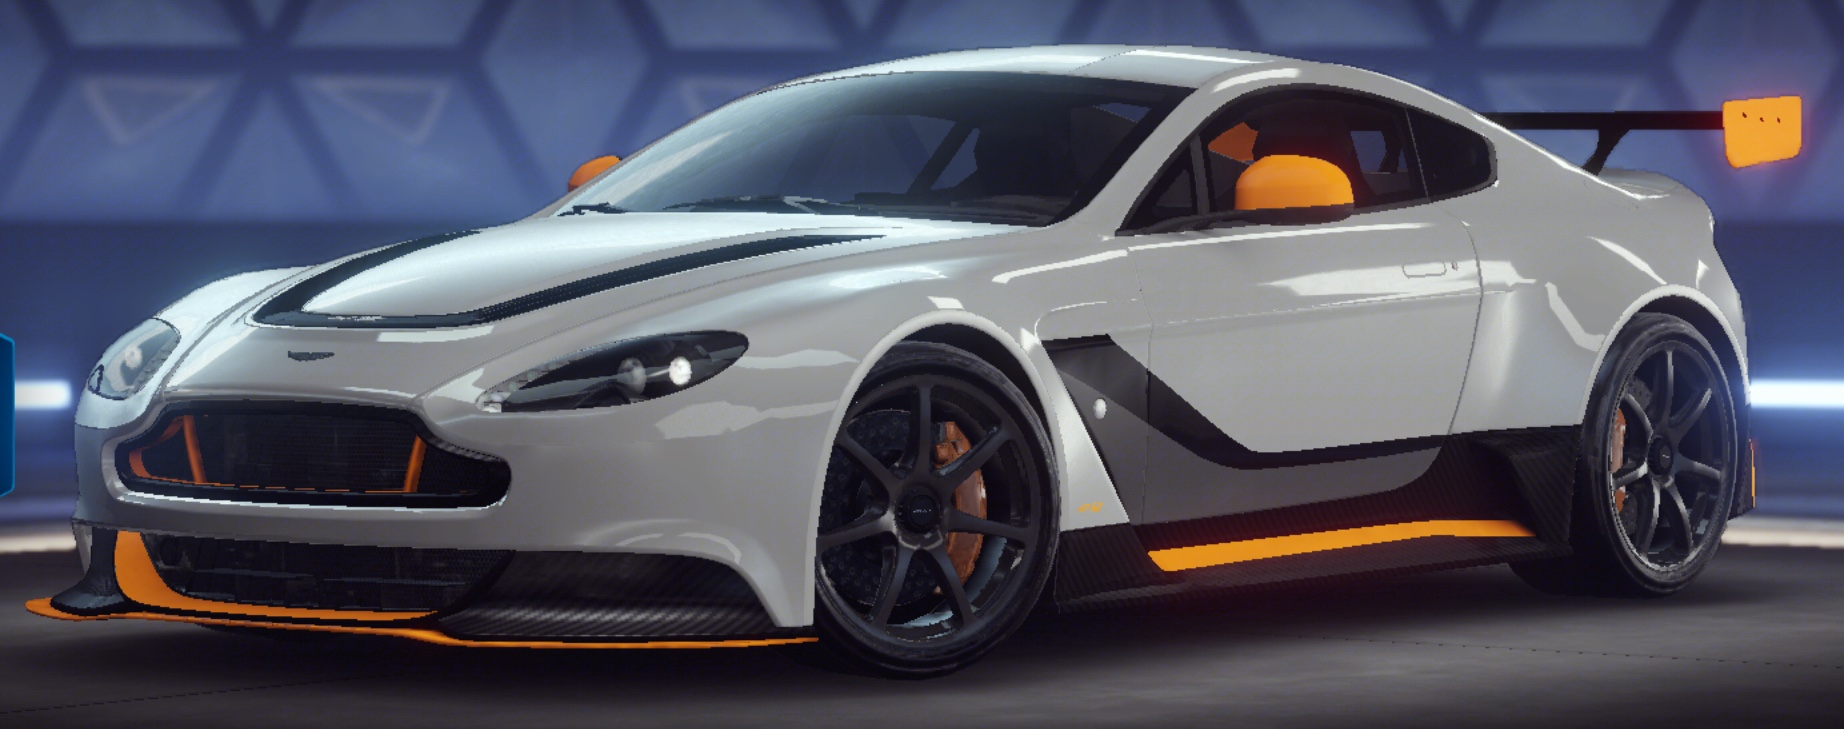 Aston Martin Vantage Gt12 Asphalt Wiki Fandom